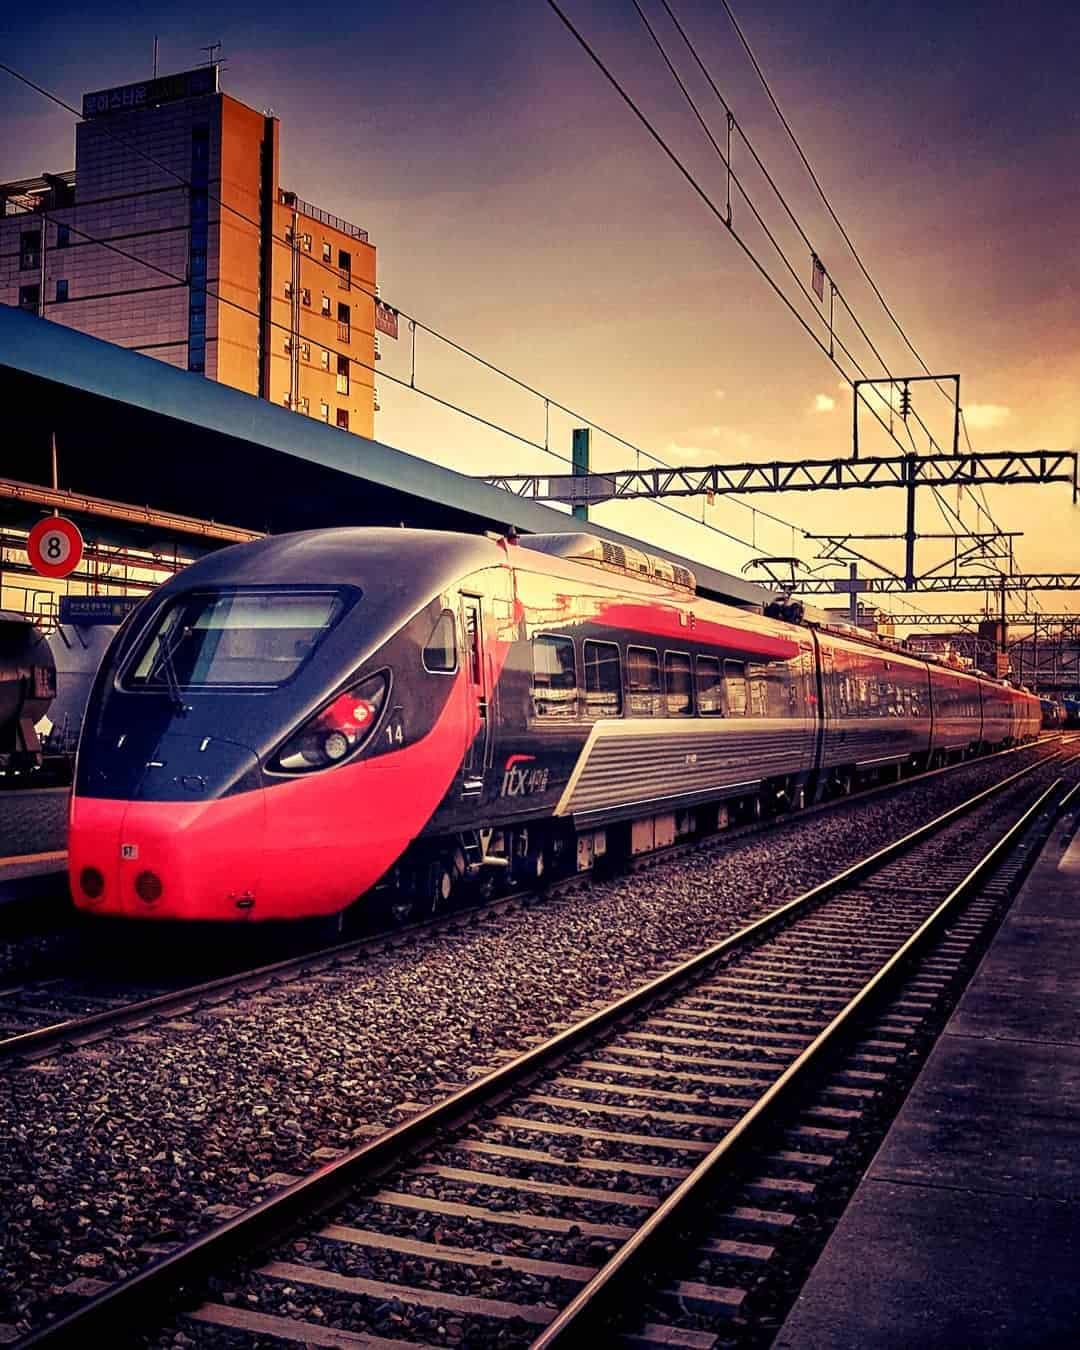 ITX (Intercity Train Express)